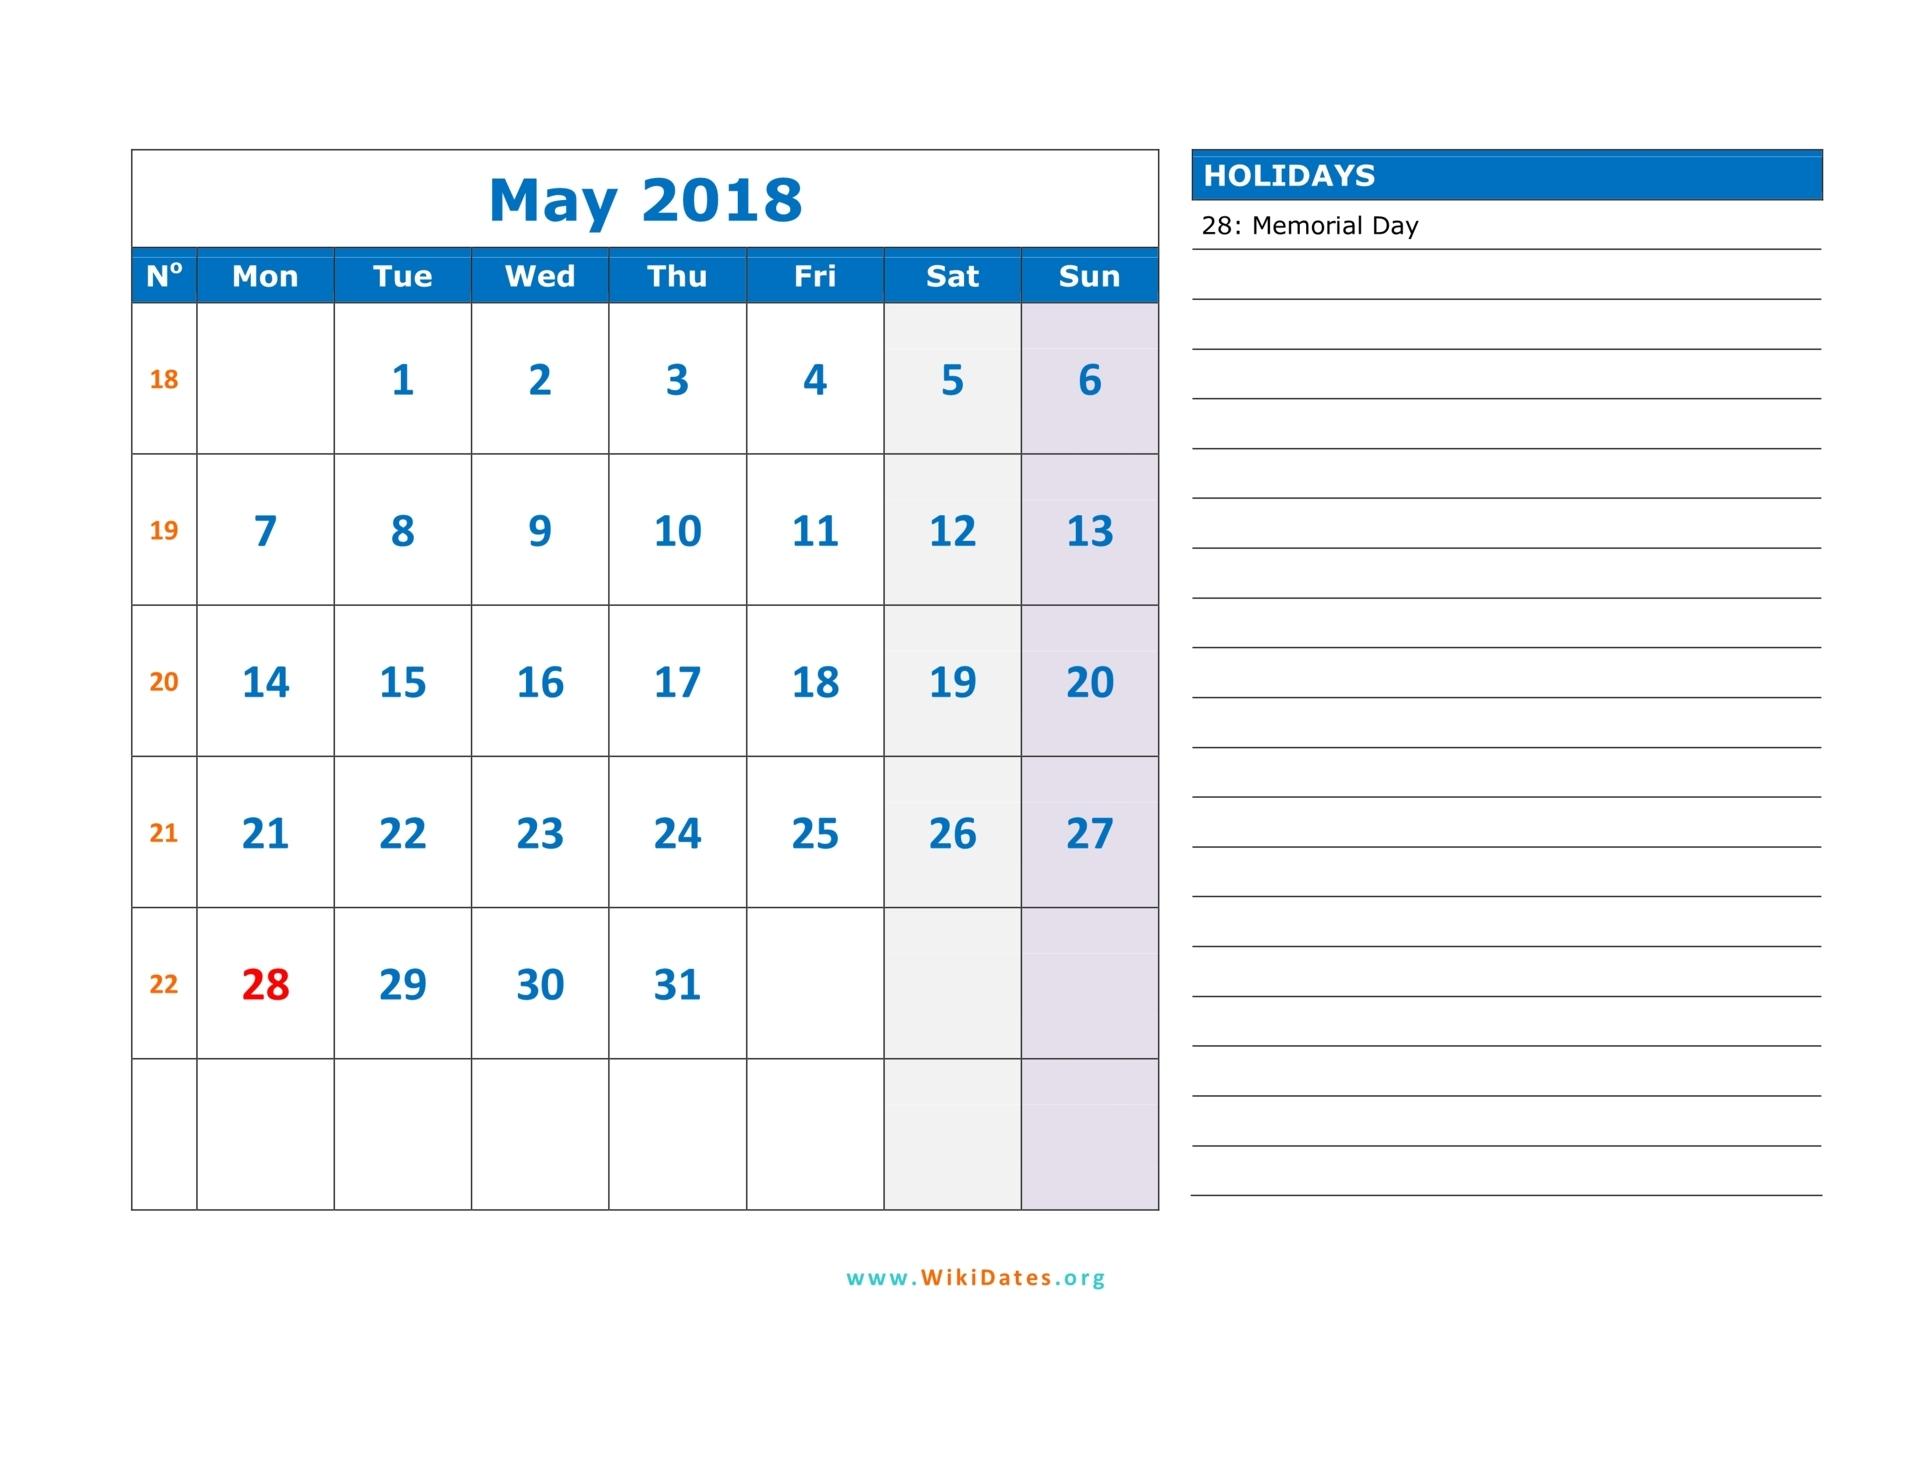 May 2018 Calendar | WikiDates.org